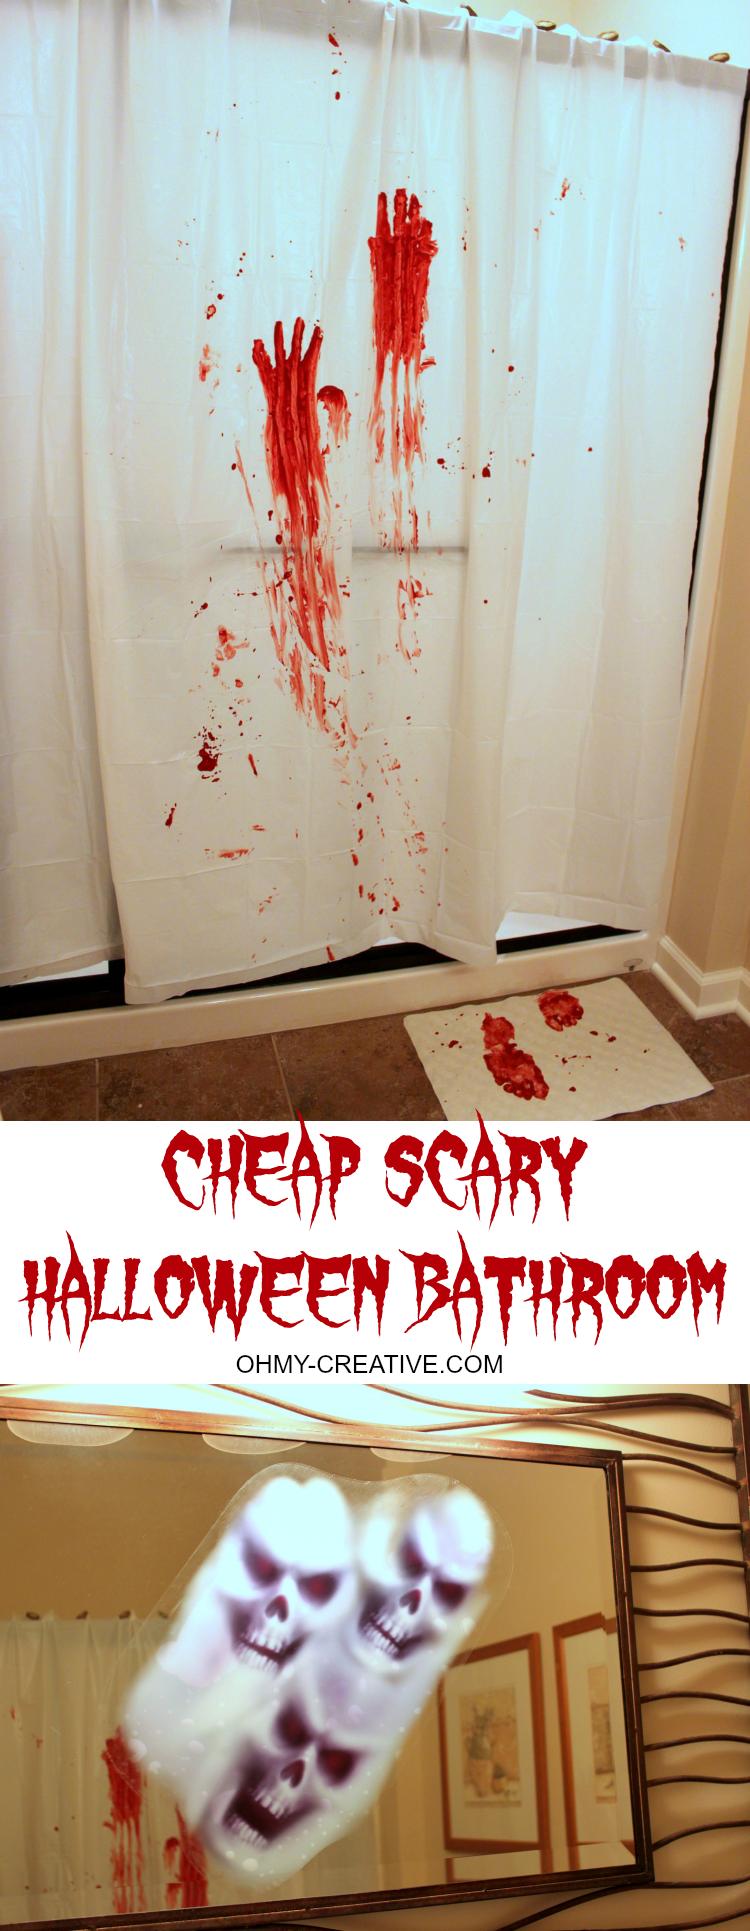 scary halloween party bathroom oh my creative